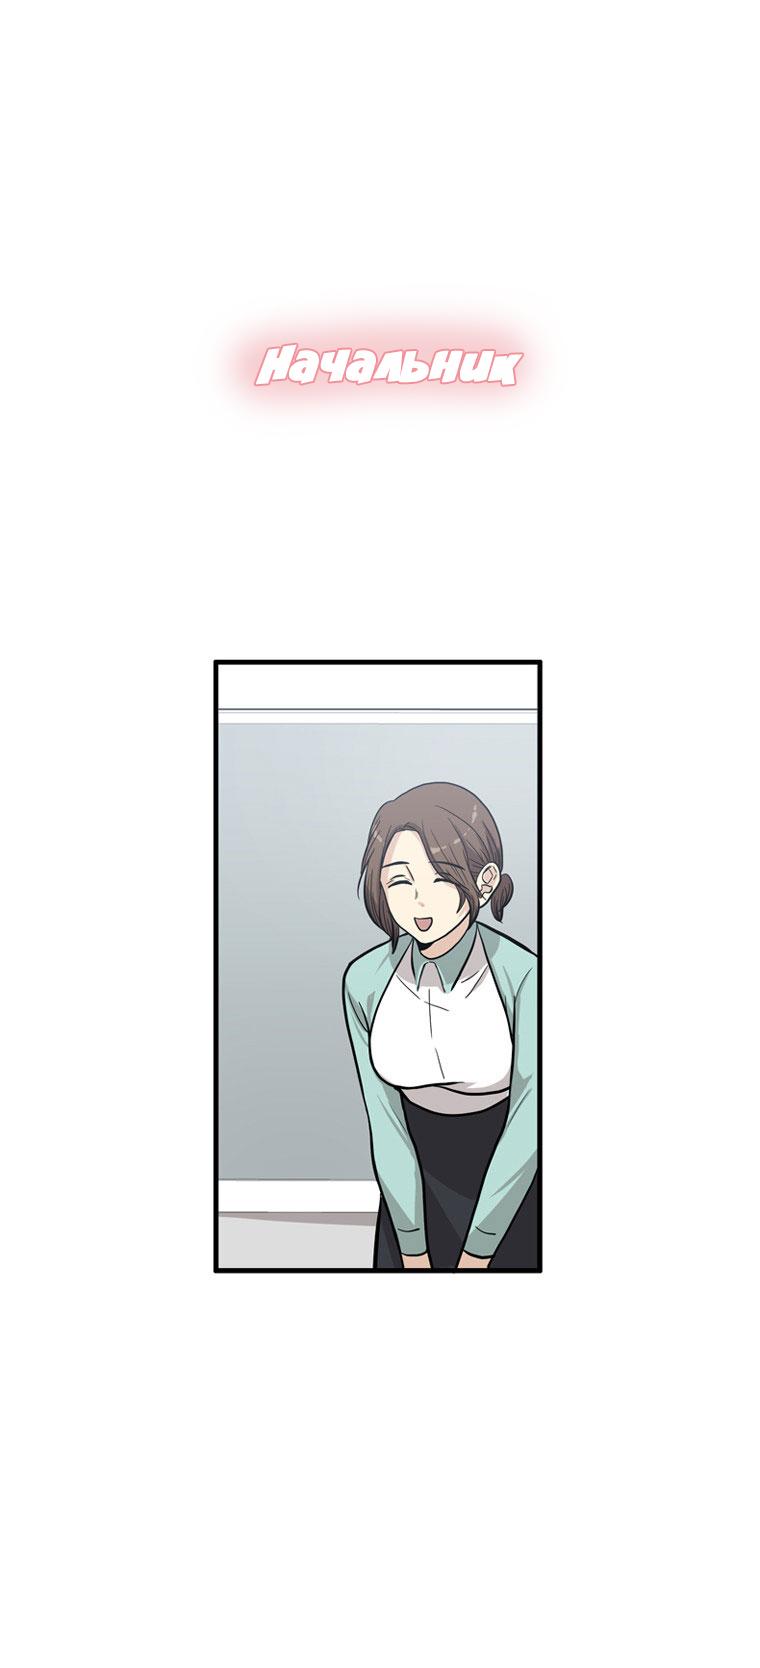 https://r1.ninemanga.com/comics/pic2/35/26851/265928/1434427699811.jpg Page 1